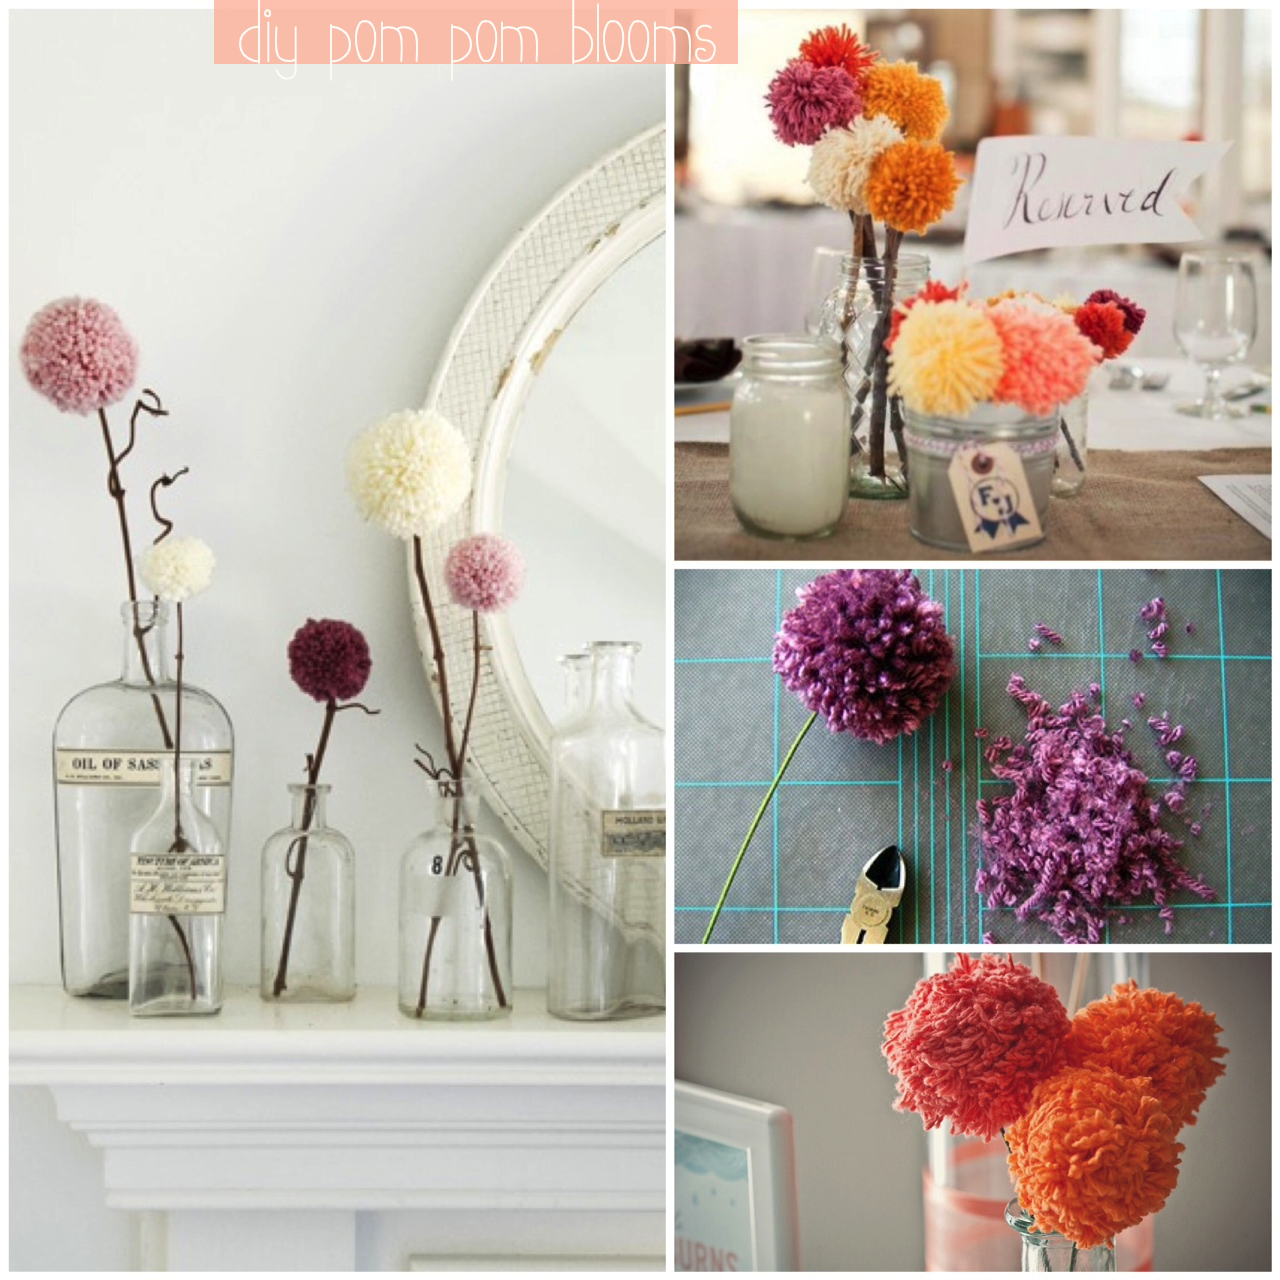 diy pom pom flowers glitter inc glitter inc. Black Bedroom Furniture Sets. Home Design Ideas